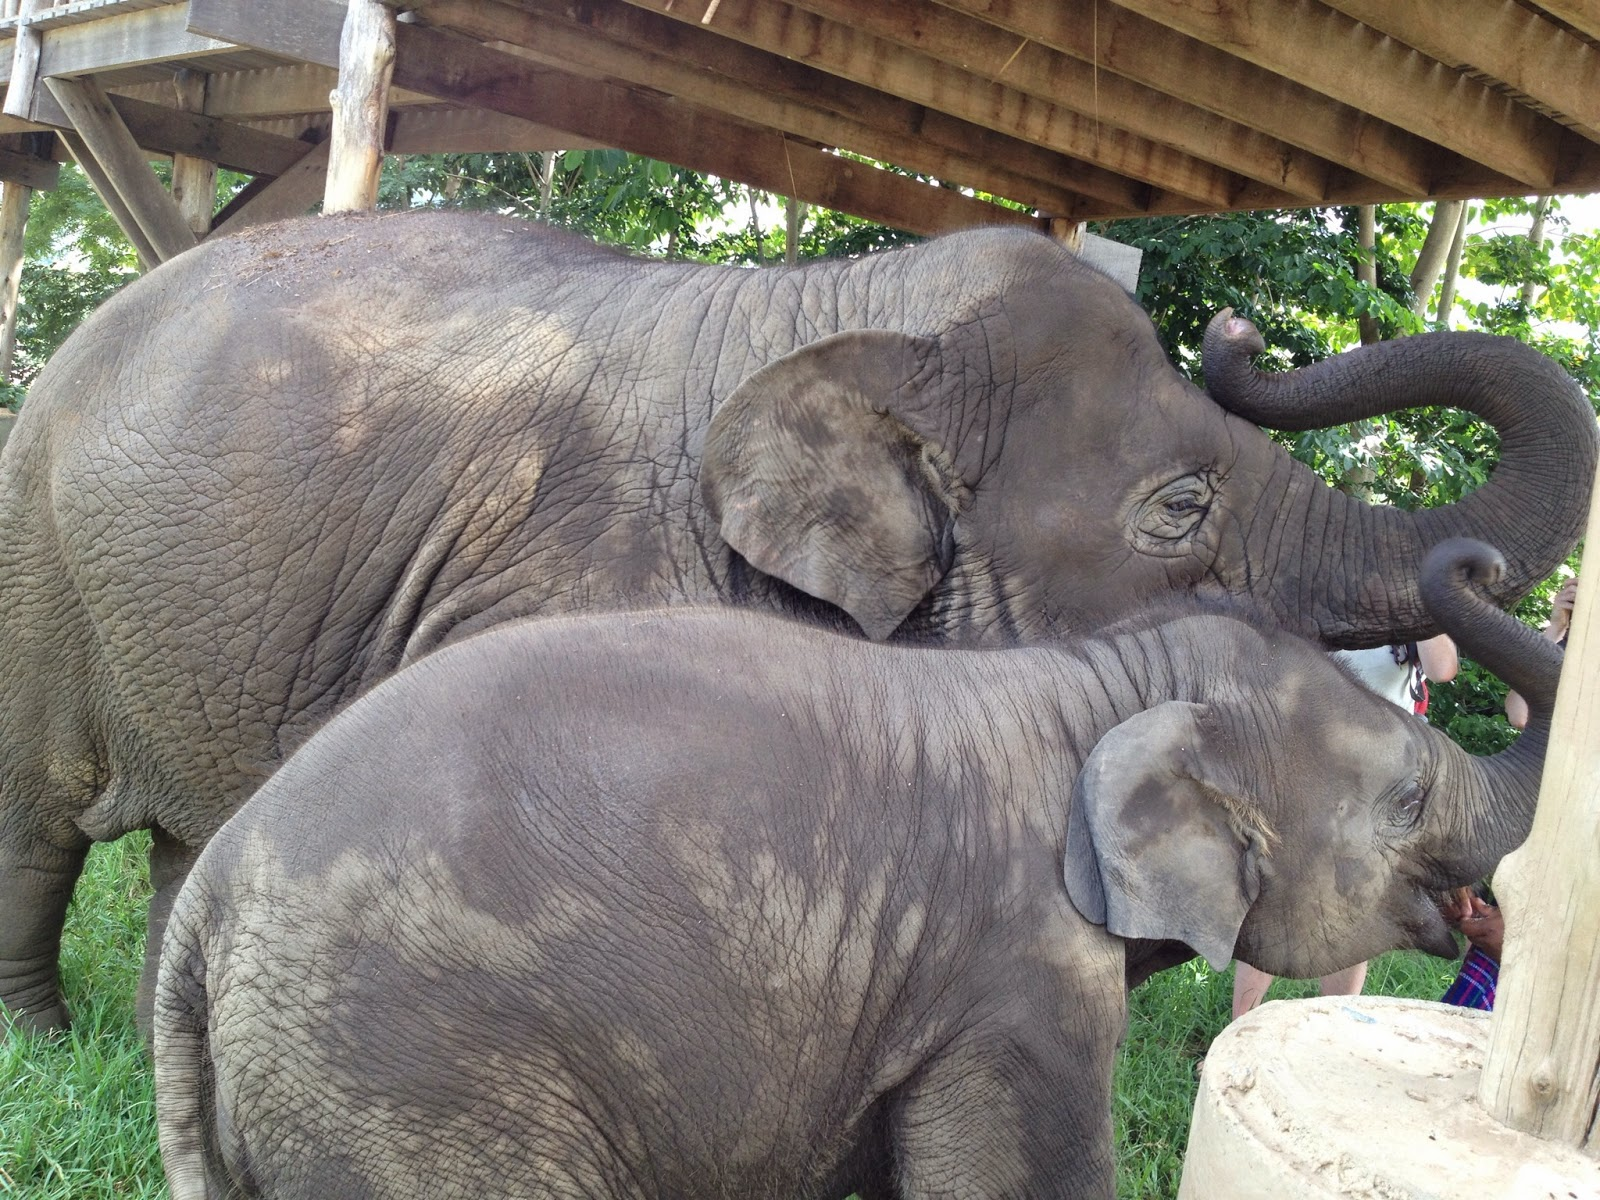 Chiang Mai - Elephants drying off and enjoying more fruit